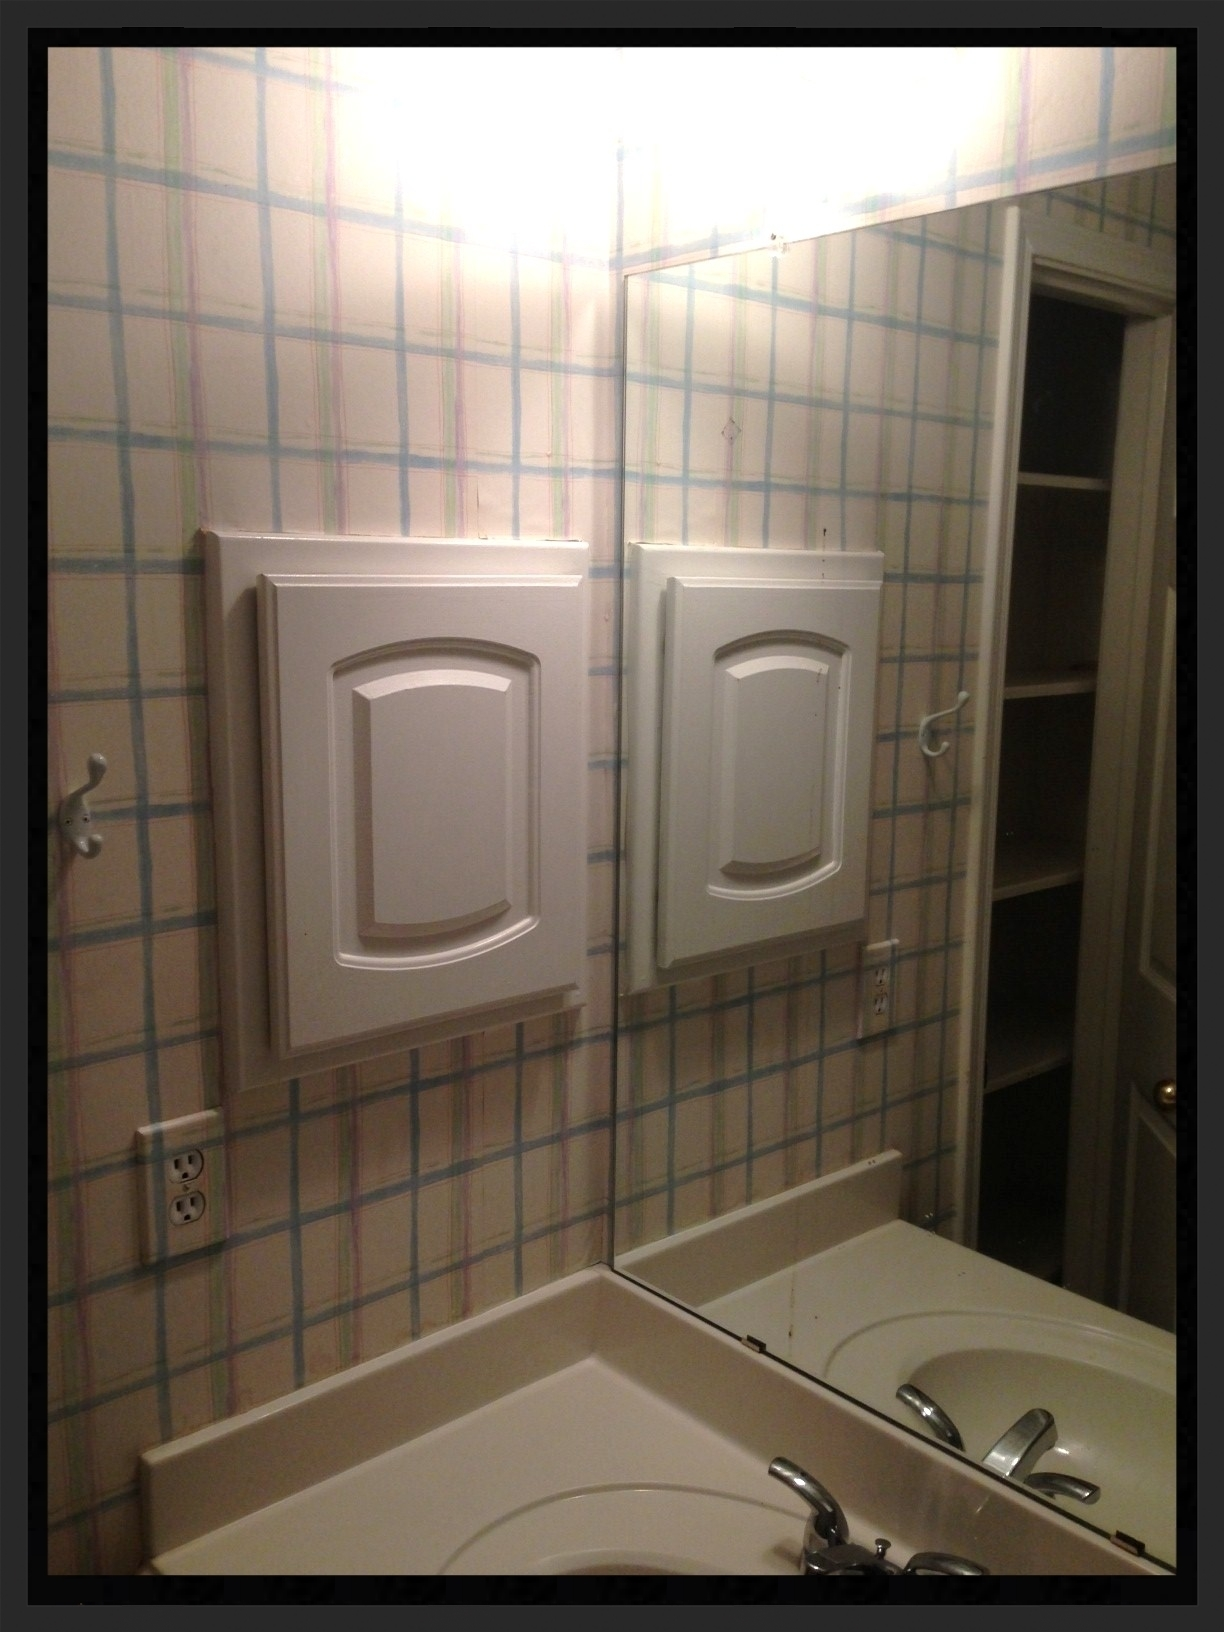 Upstairs bath BEFORE - Medicine cabinet.JPG